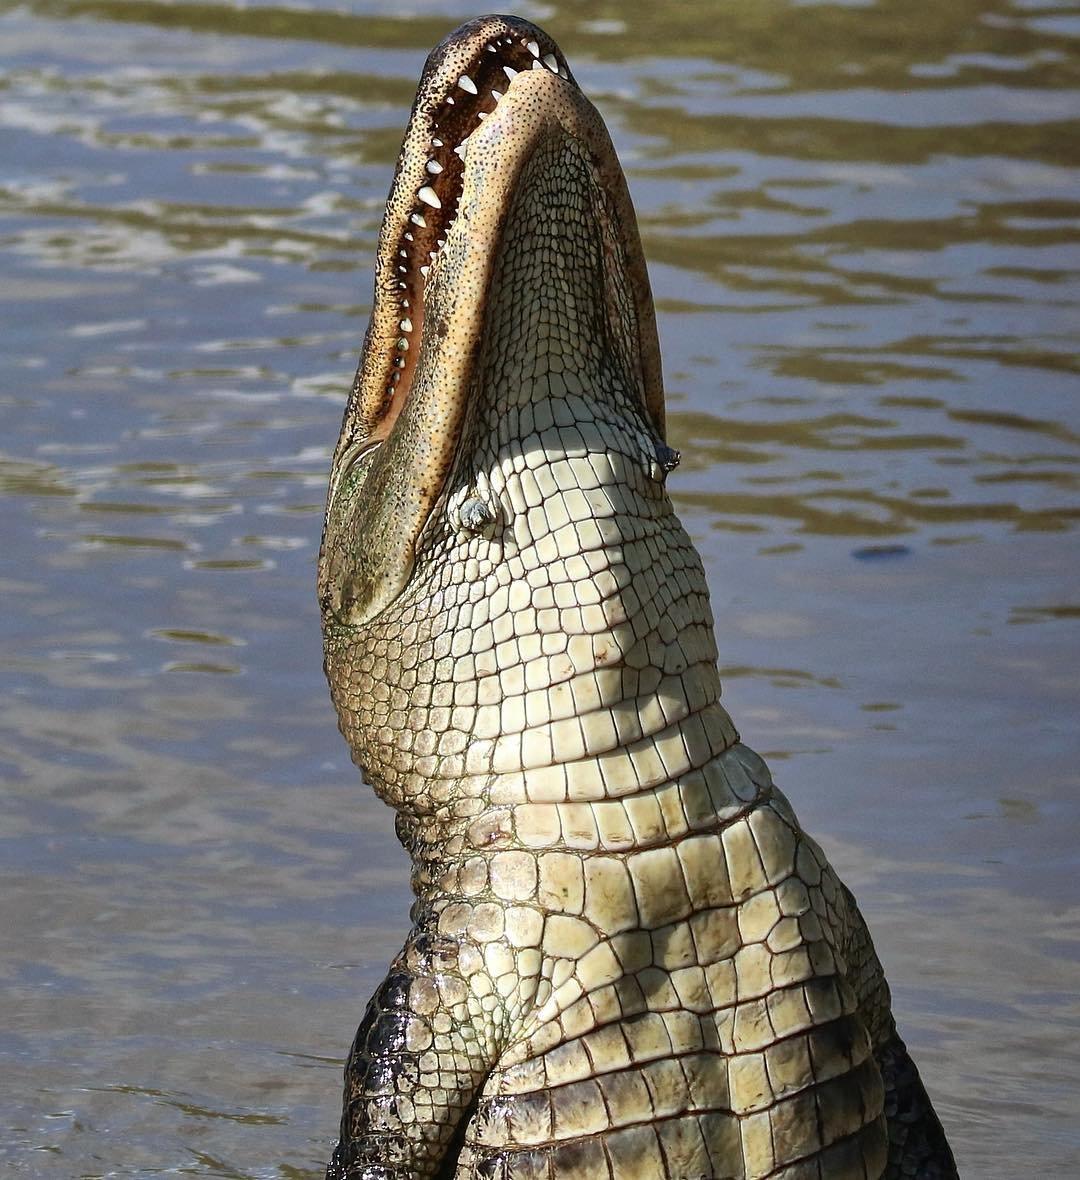 Jumping Aligator in Wild Florida